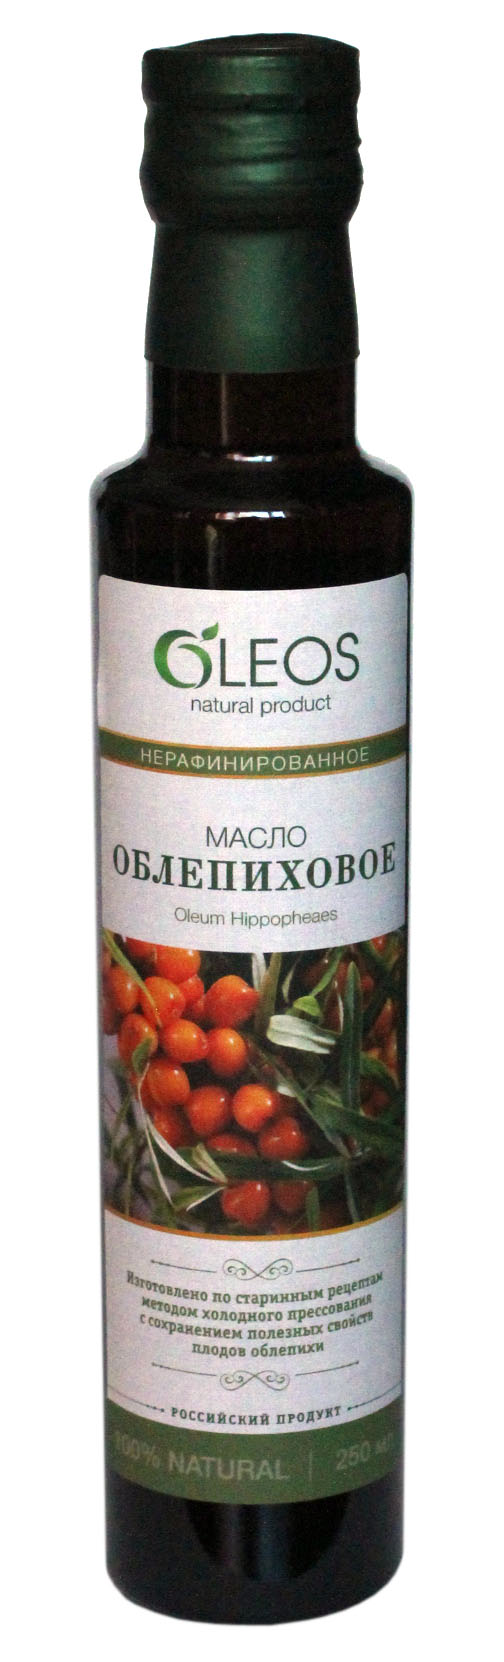 Фото - Масло Oleos Dorika Облепиховое, 250 мл облепиховое масло 50 мл бад